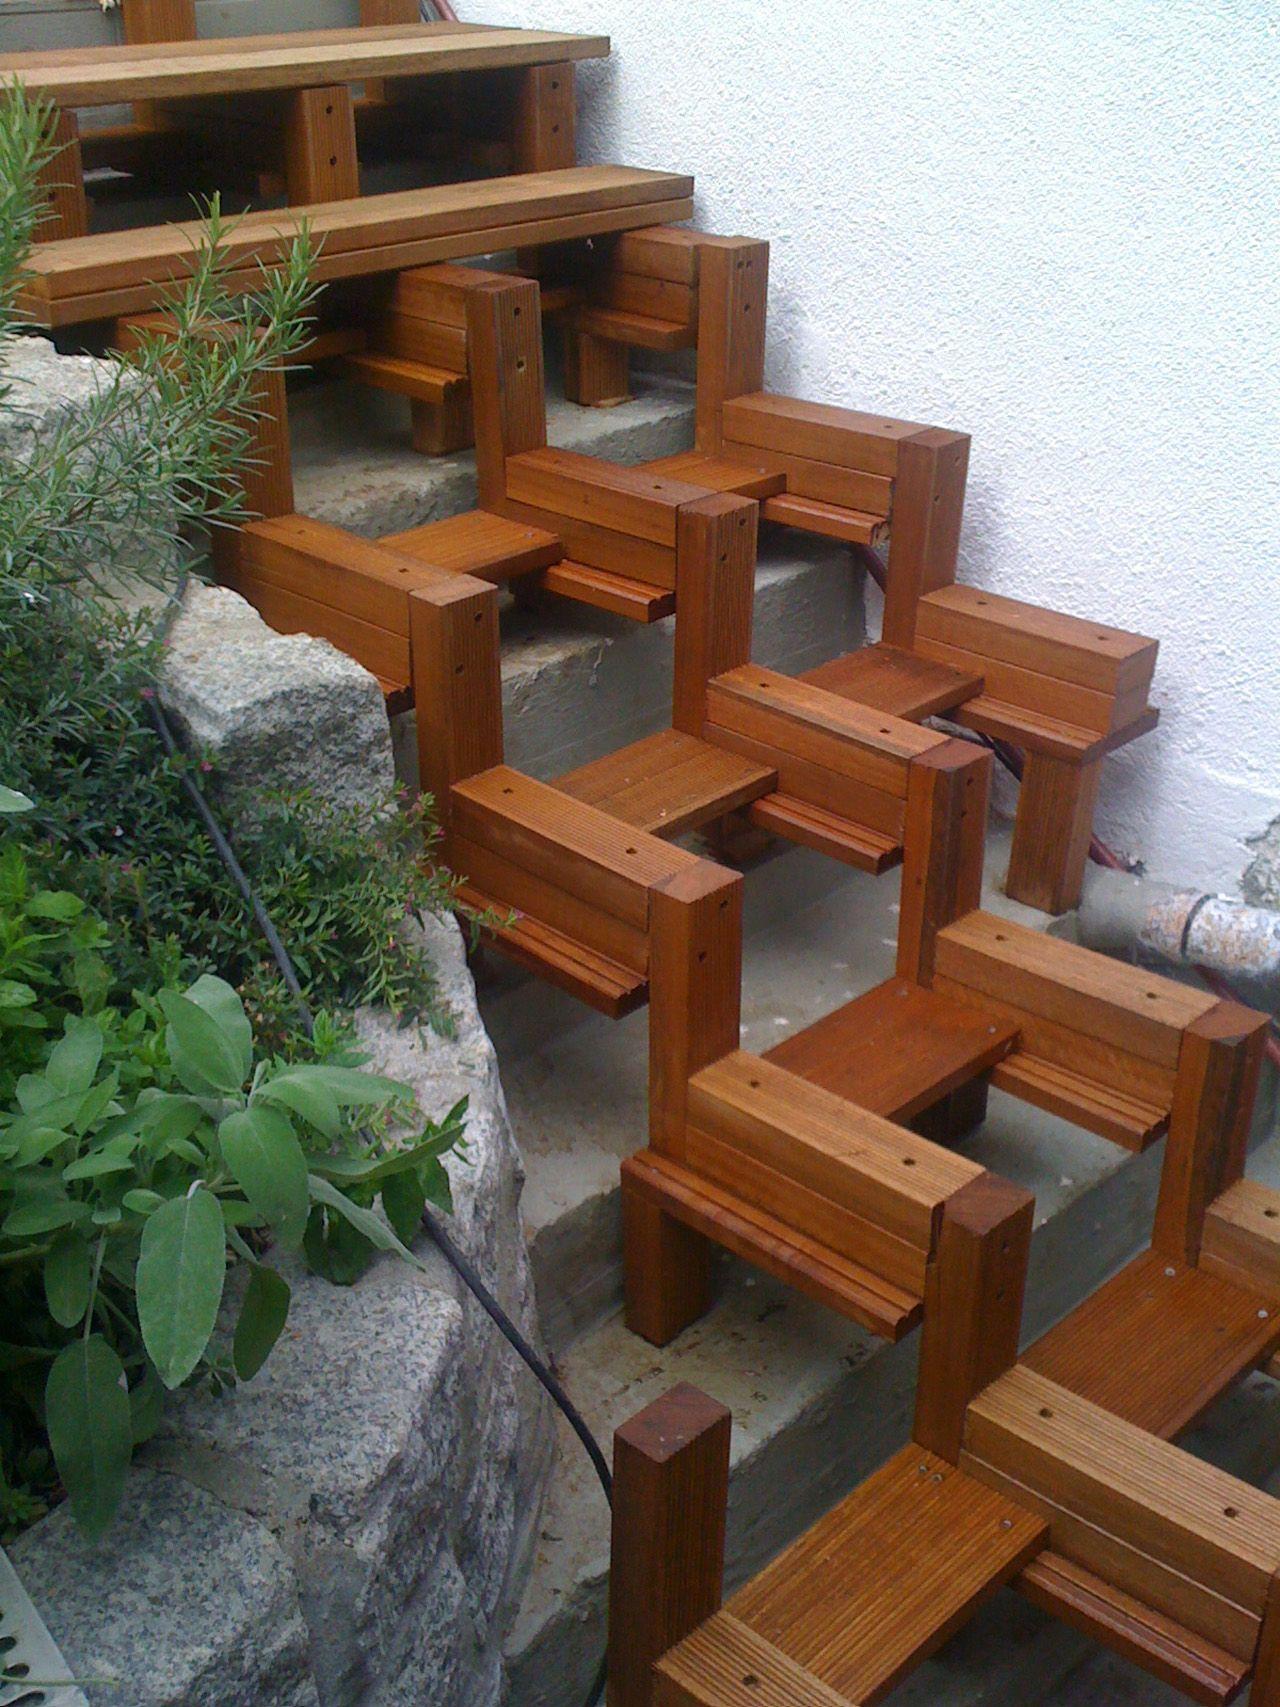 terrasse bauen treppe | garten | pinterest | balcony, balcony garden